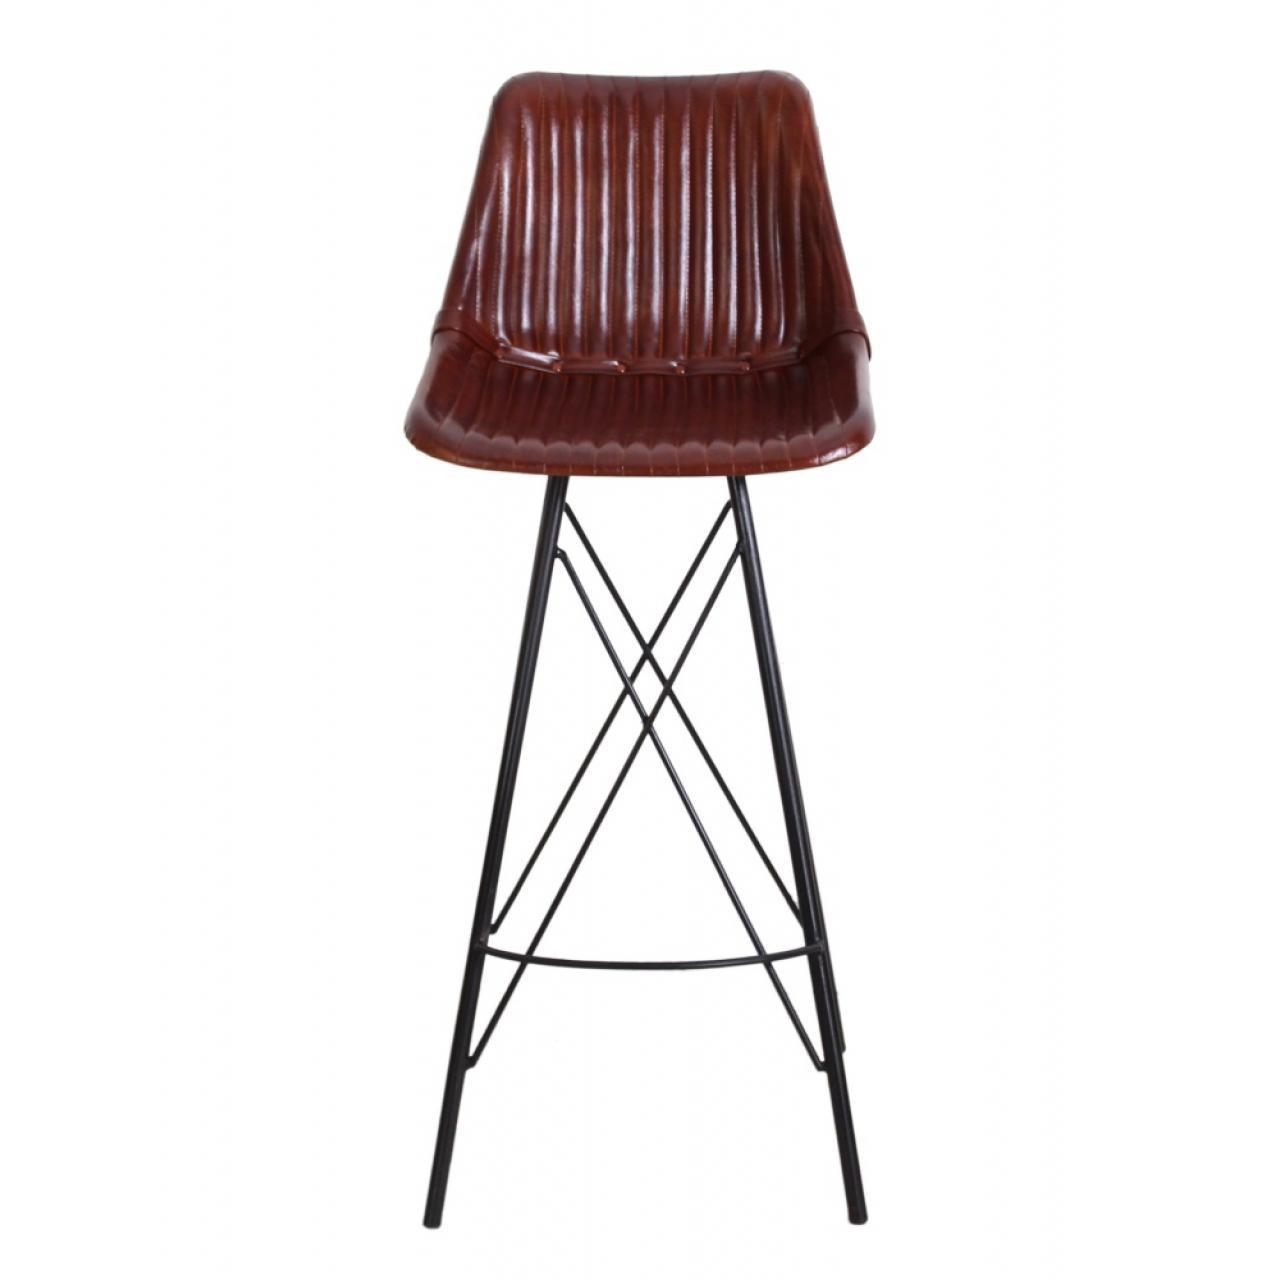 barhocker sit chairs dunkelbraun st hle hocker